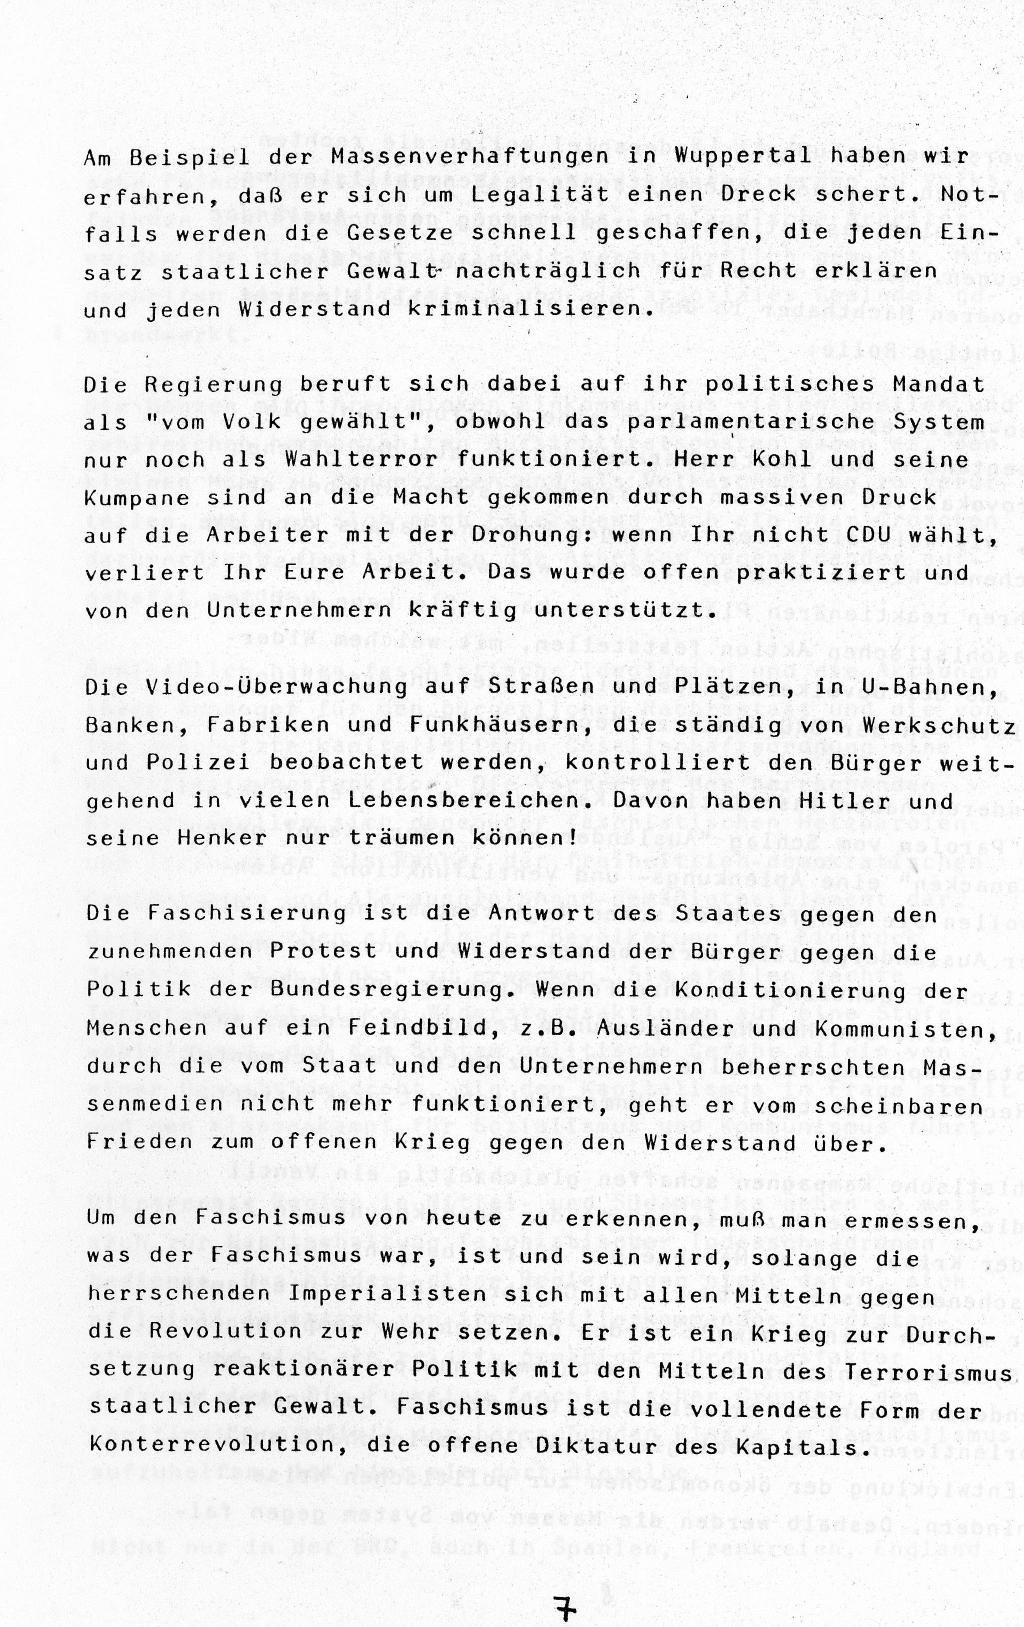 Berlin_1983_Autonome_Gruppen_Faschismus_im_Kapitalismus_07